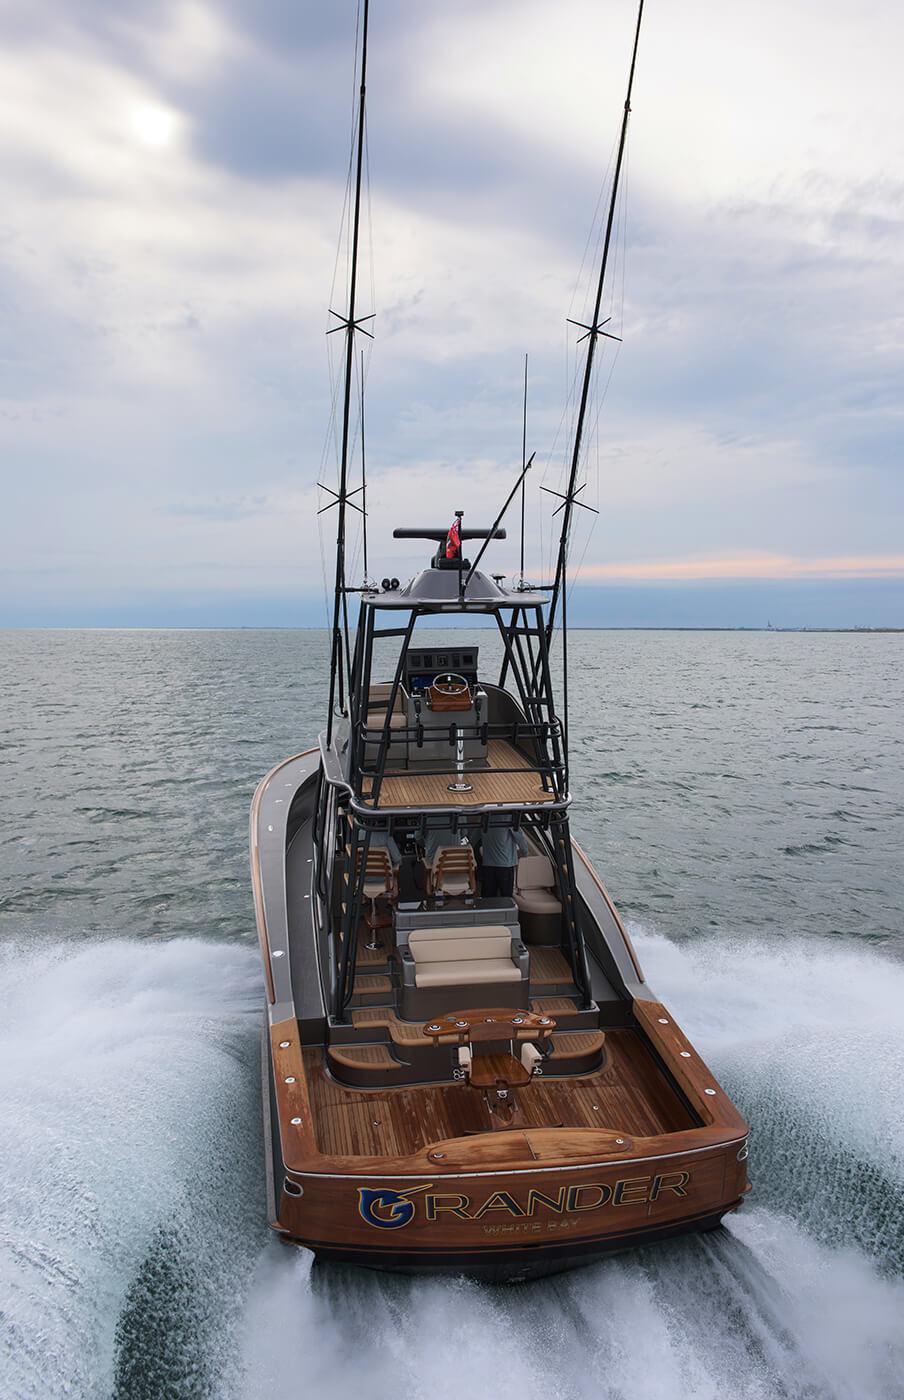 Grander White Bay Boat Transom underway hard drop shadows